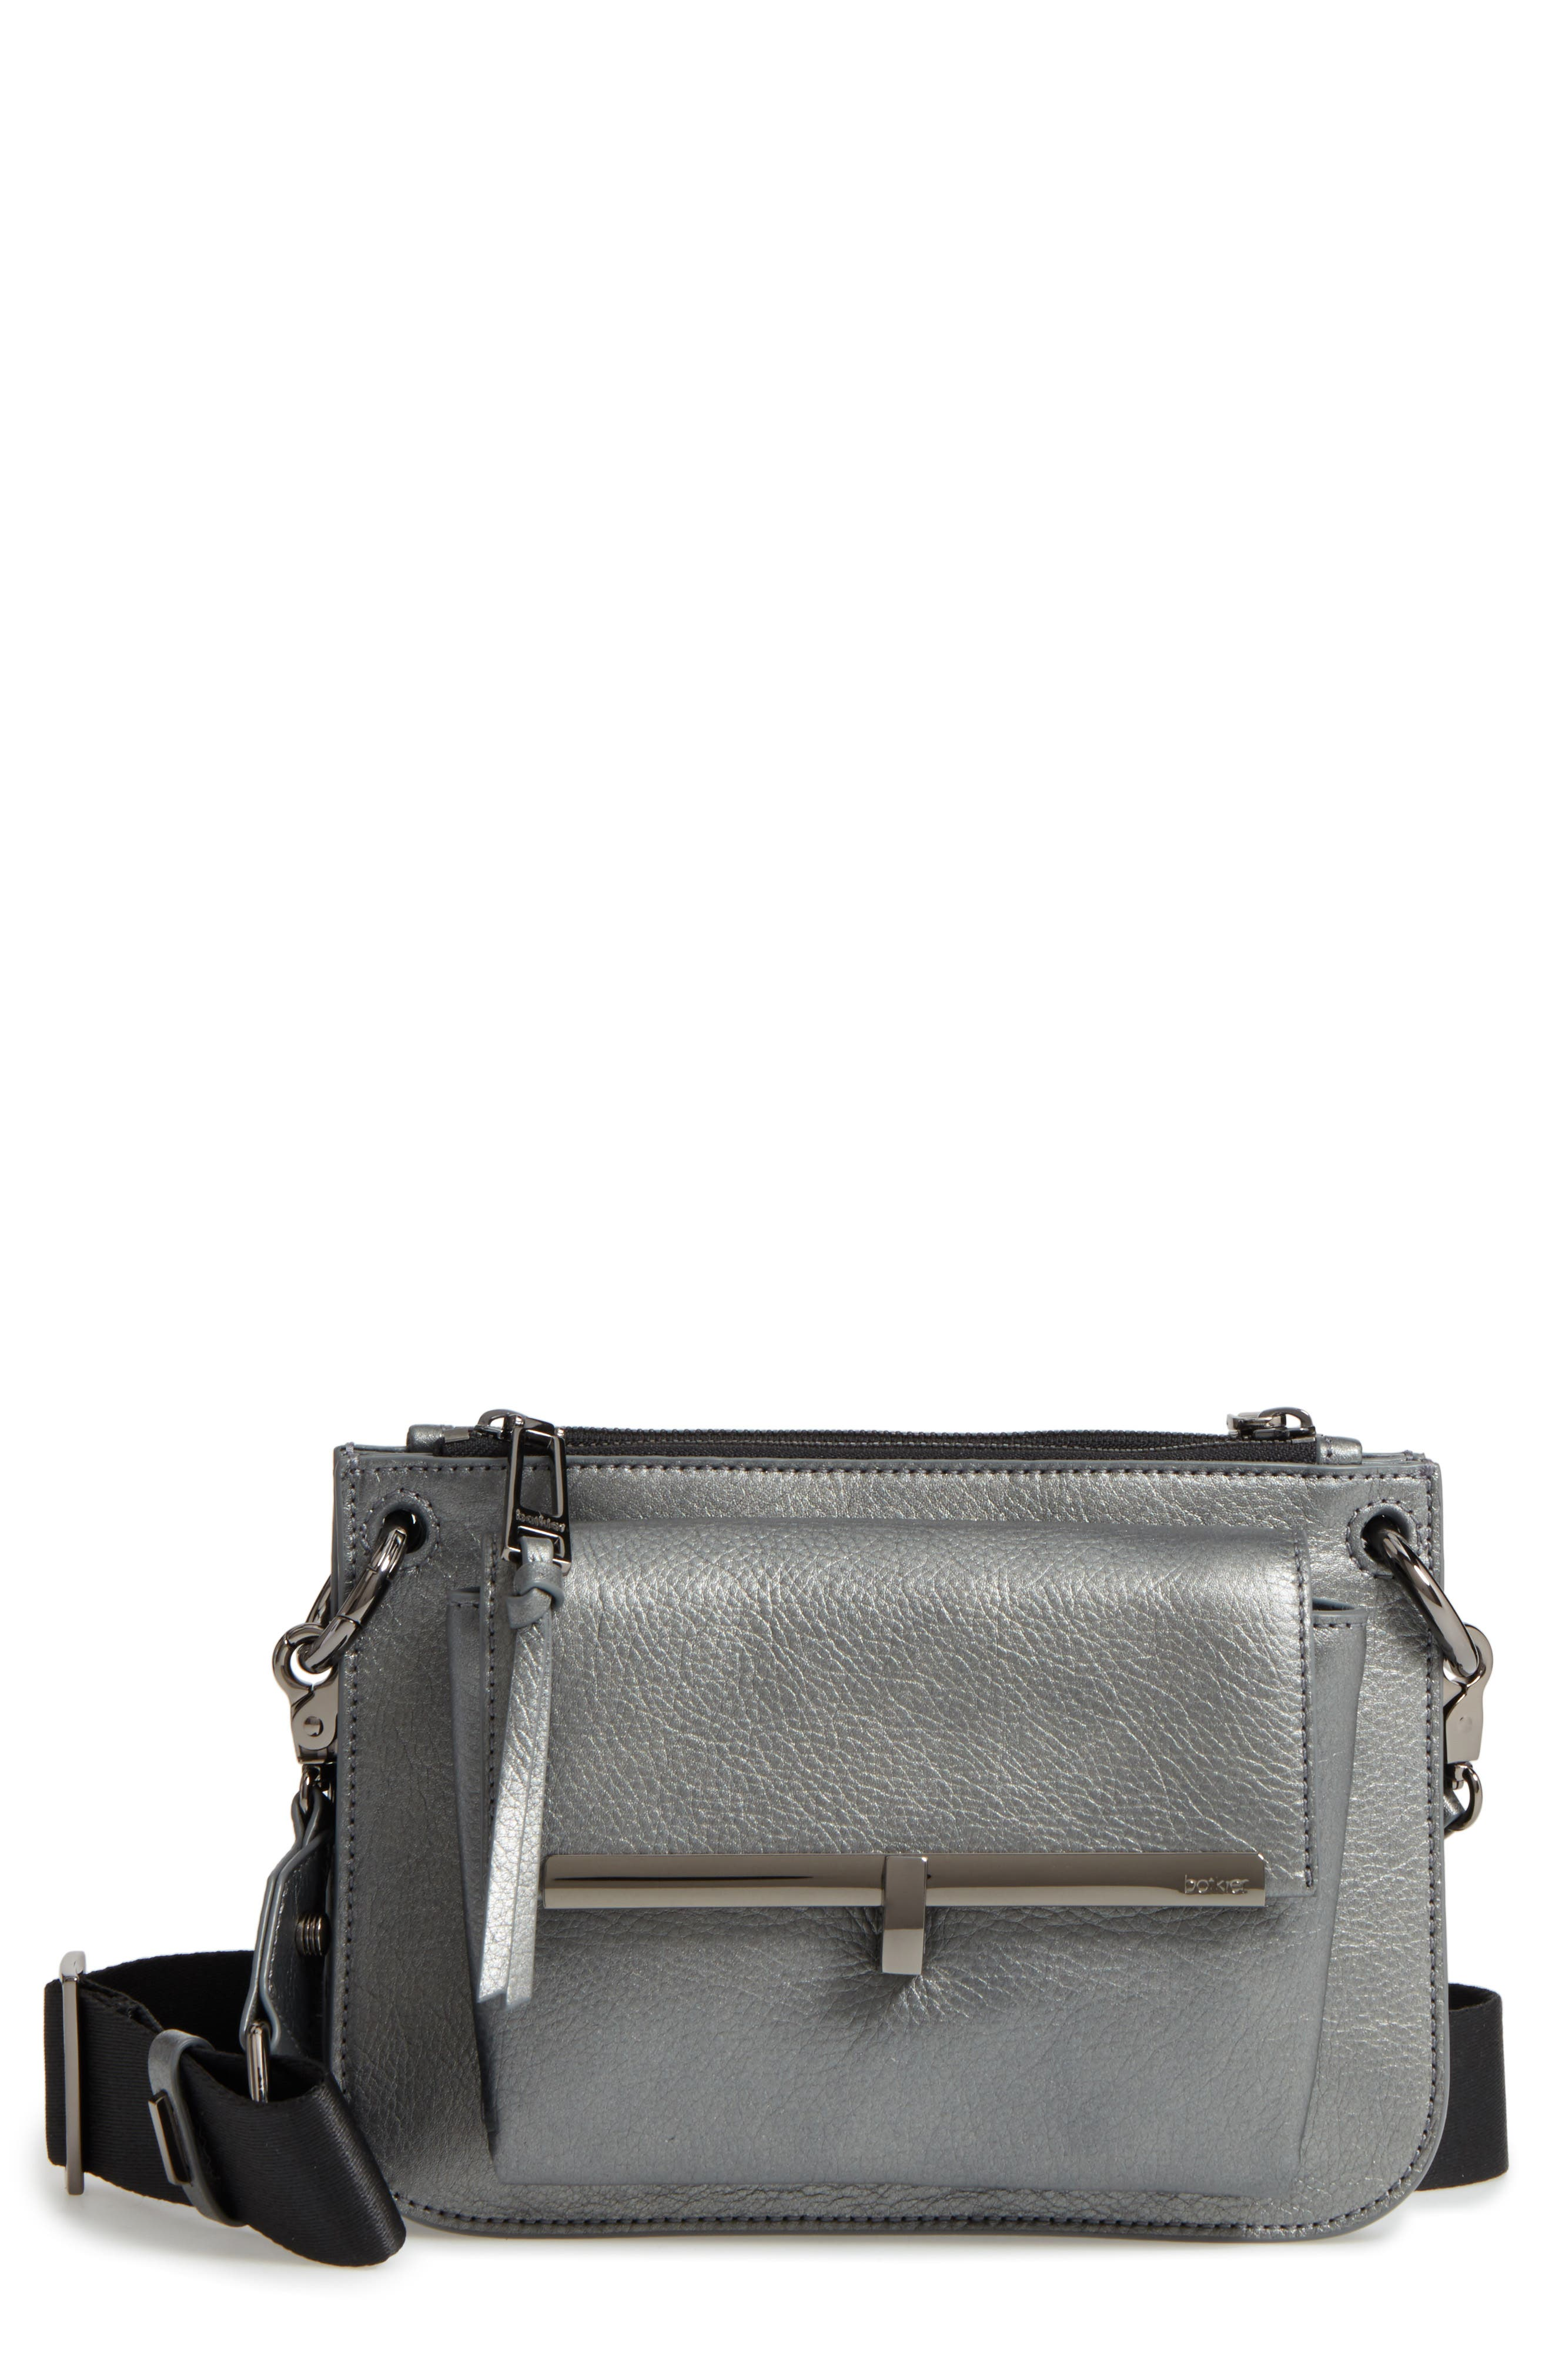 Bleeker Leather Double Shoulder Bag,                             Main thumbnail 1, color,                             Gunmetal